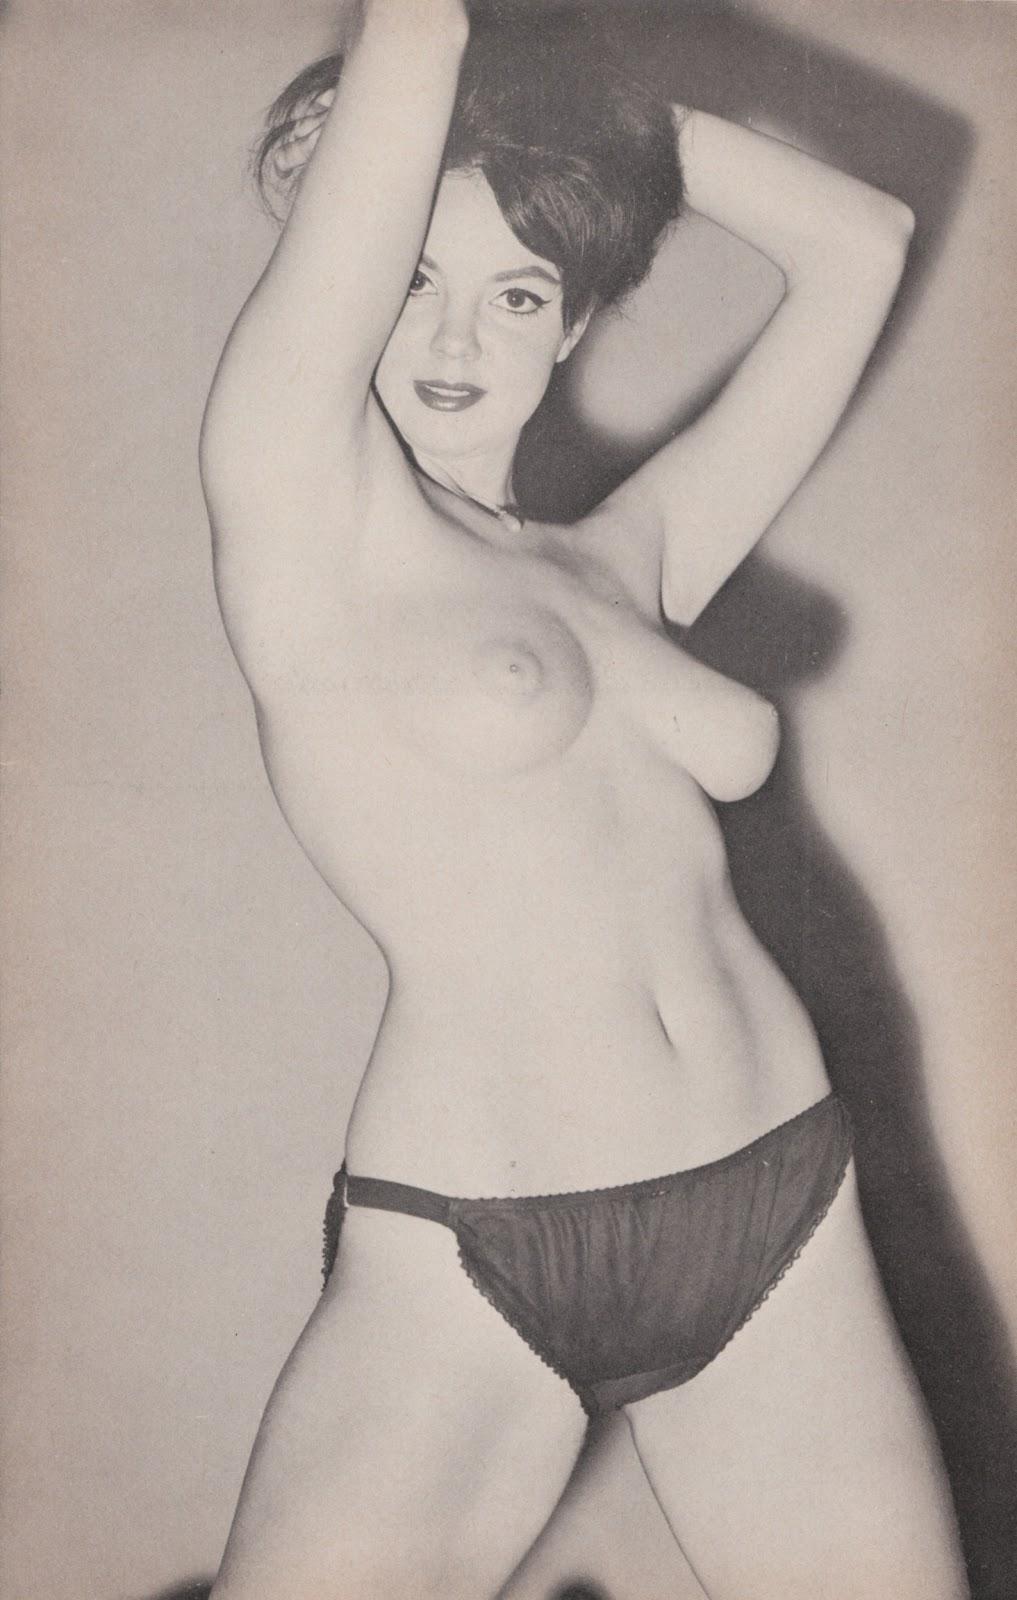 Suzanne pleshette nude